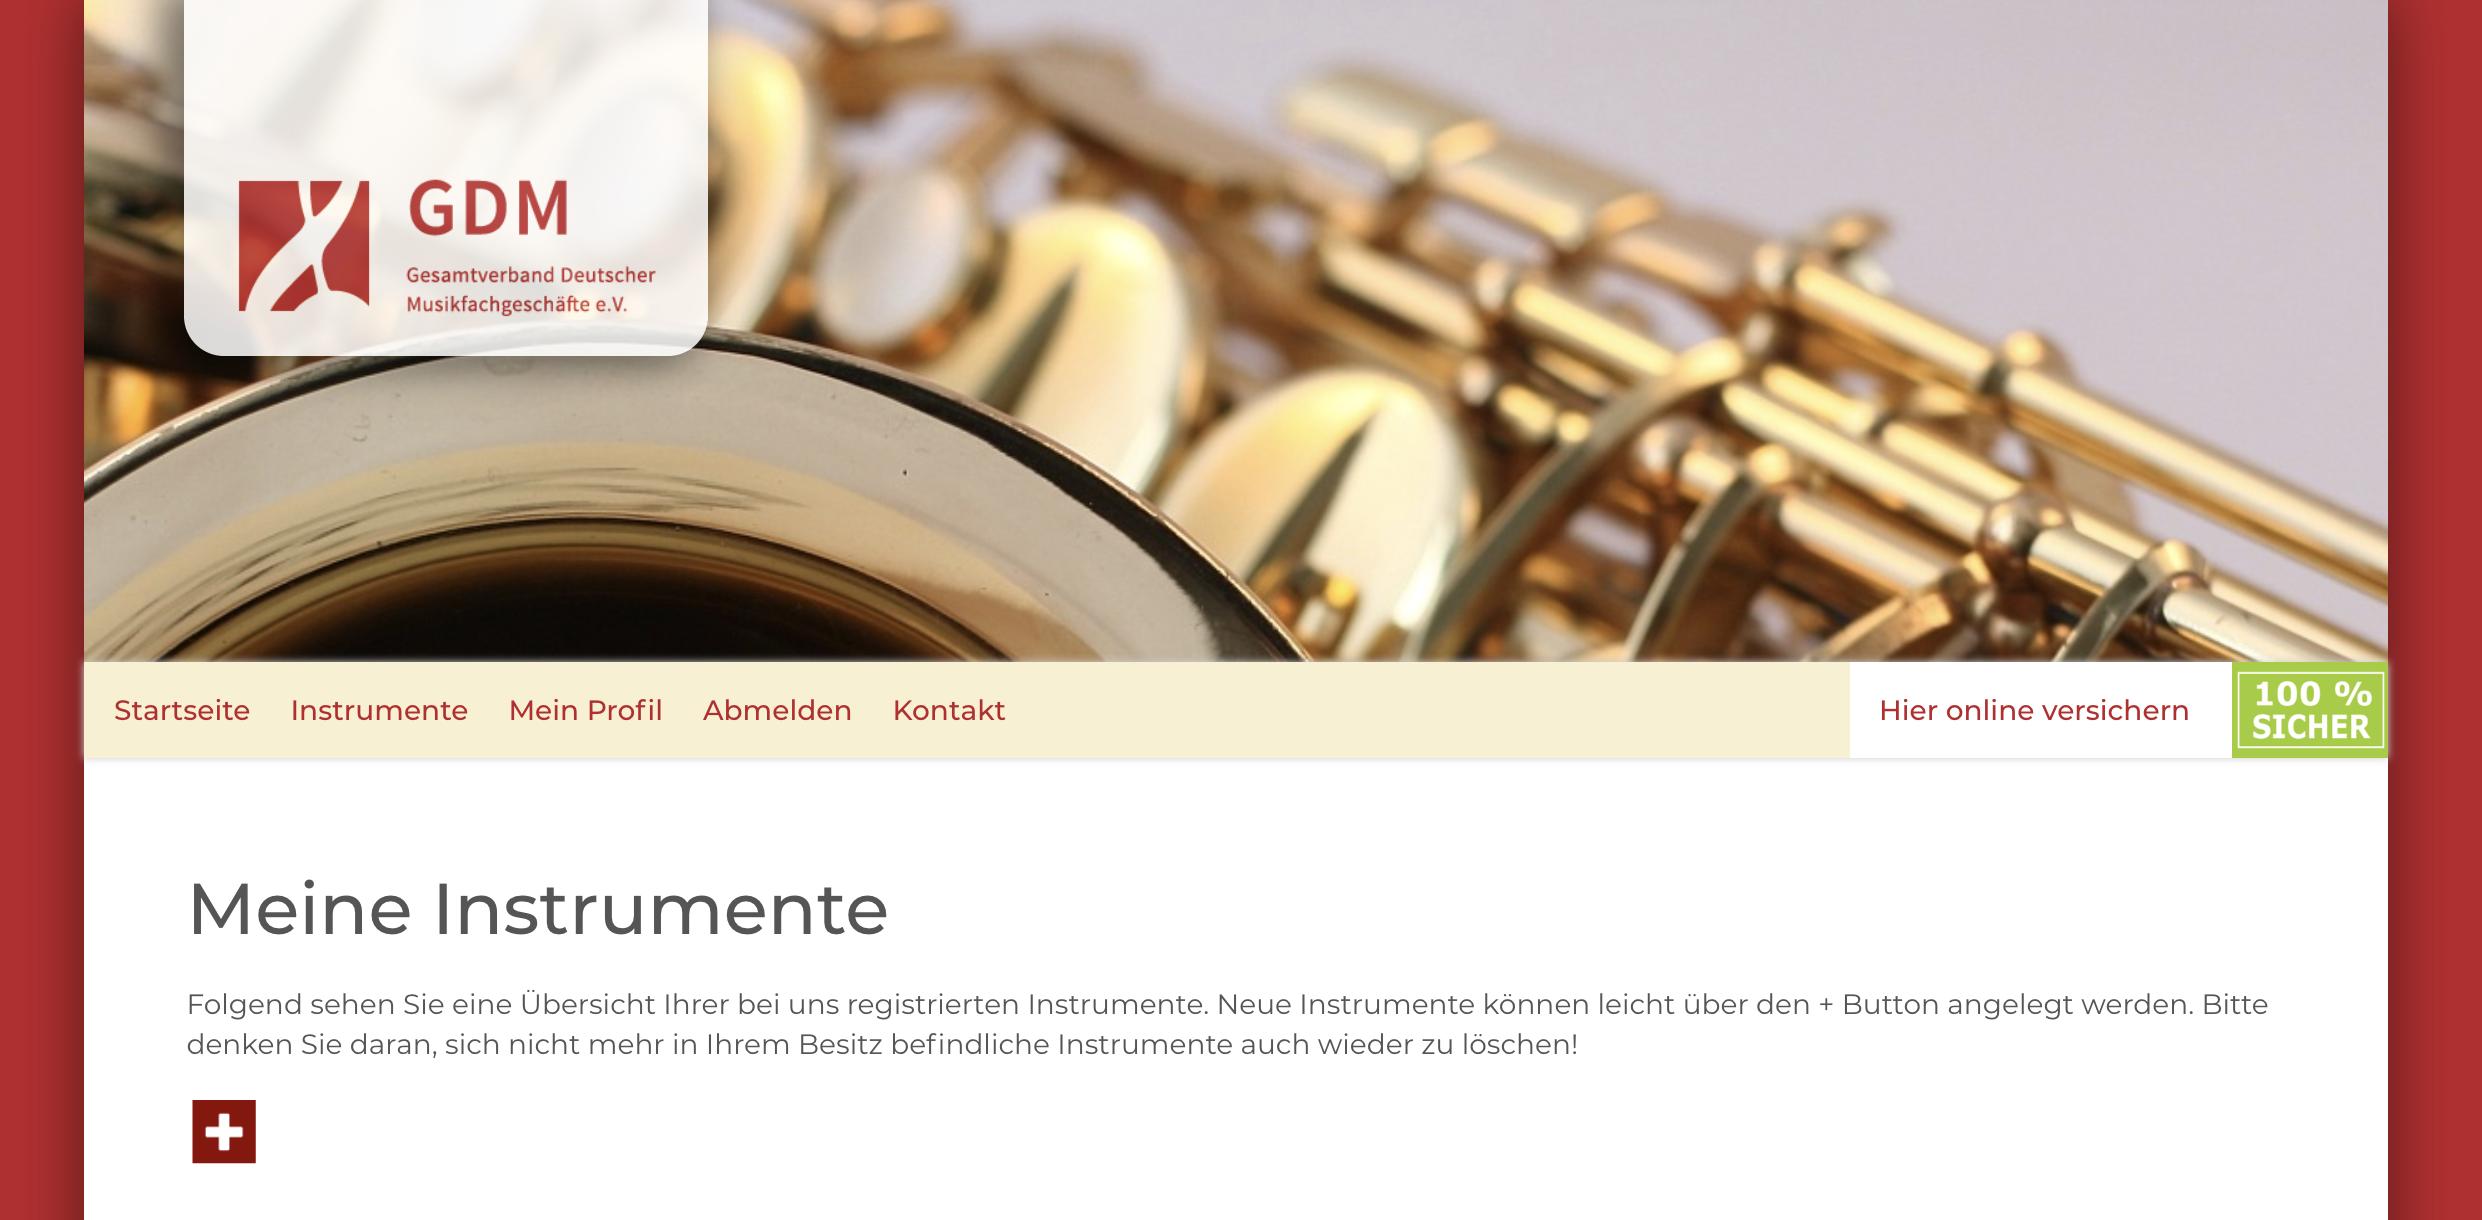 Instrumentenklau.de verhindert Instrumentendiebstahl - jetzt registrieren